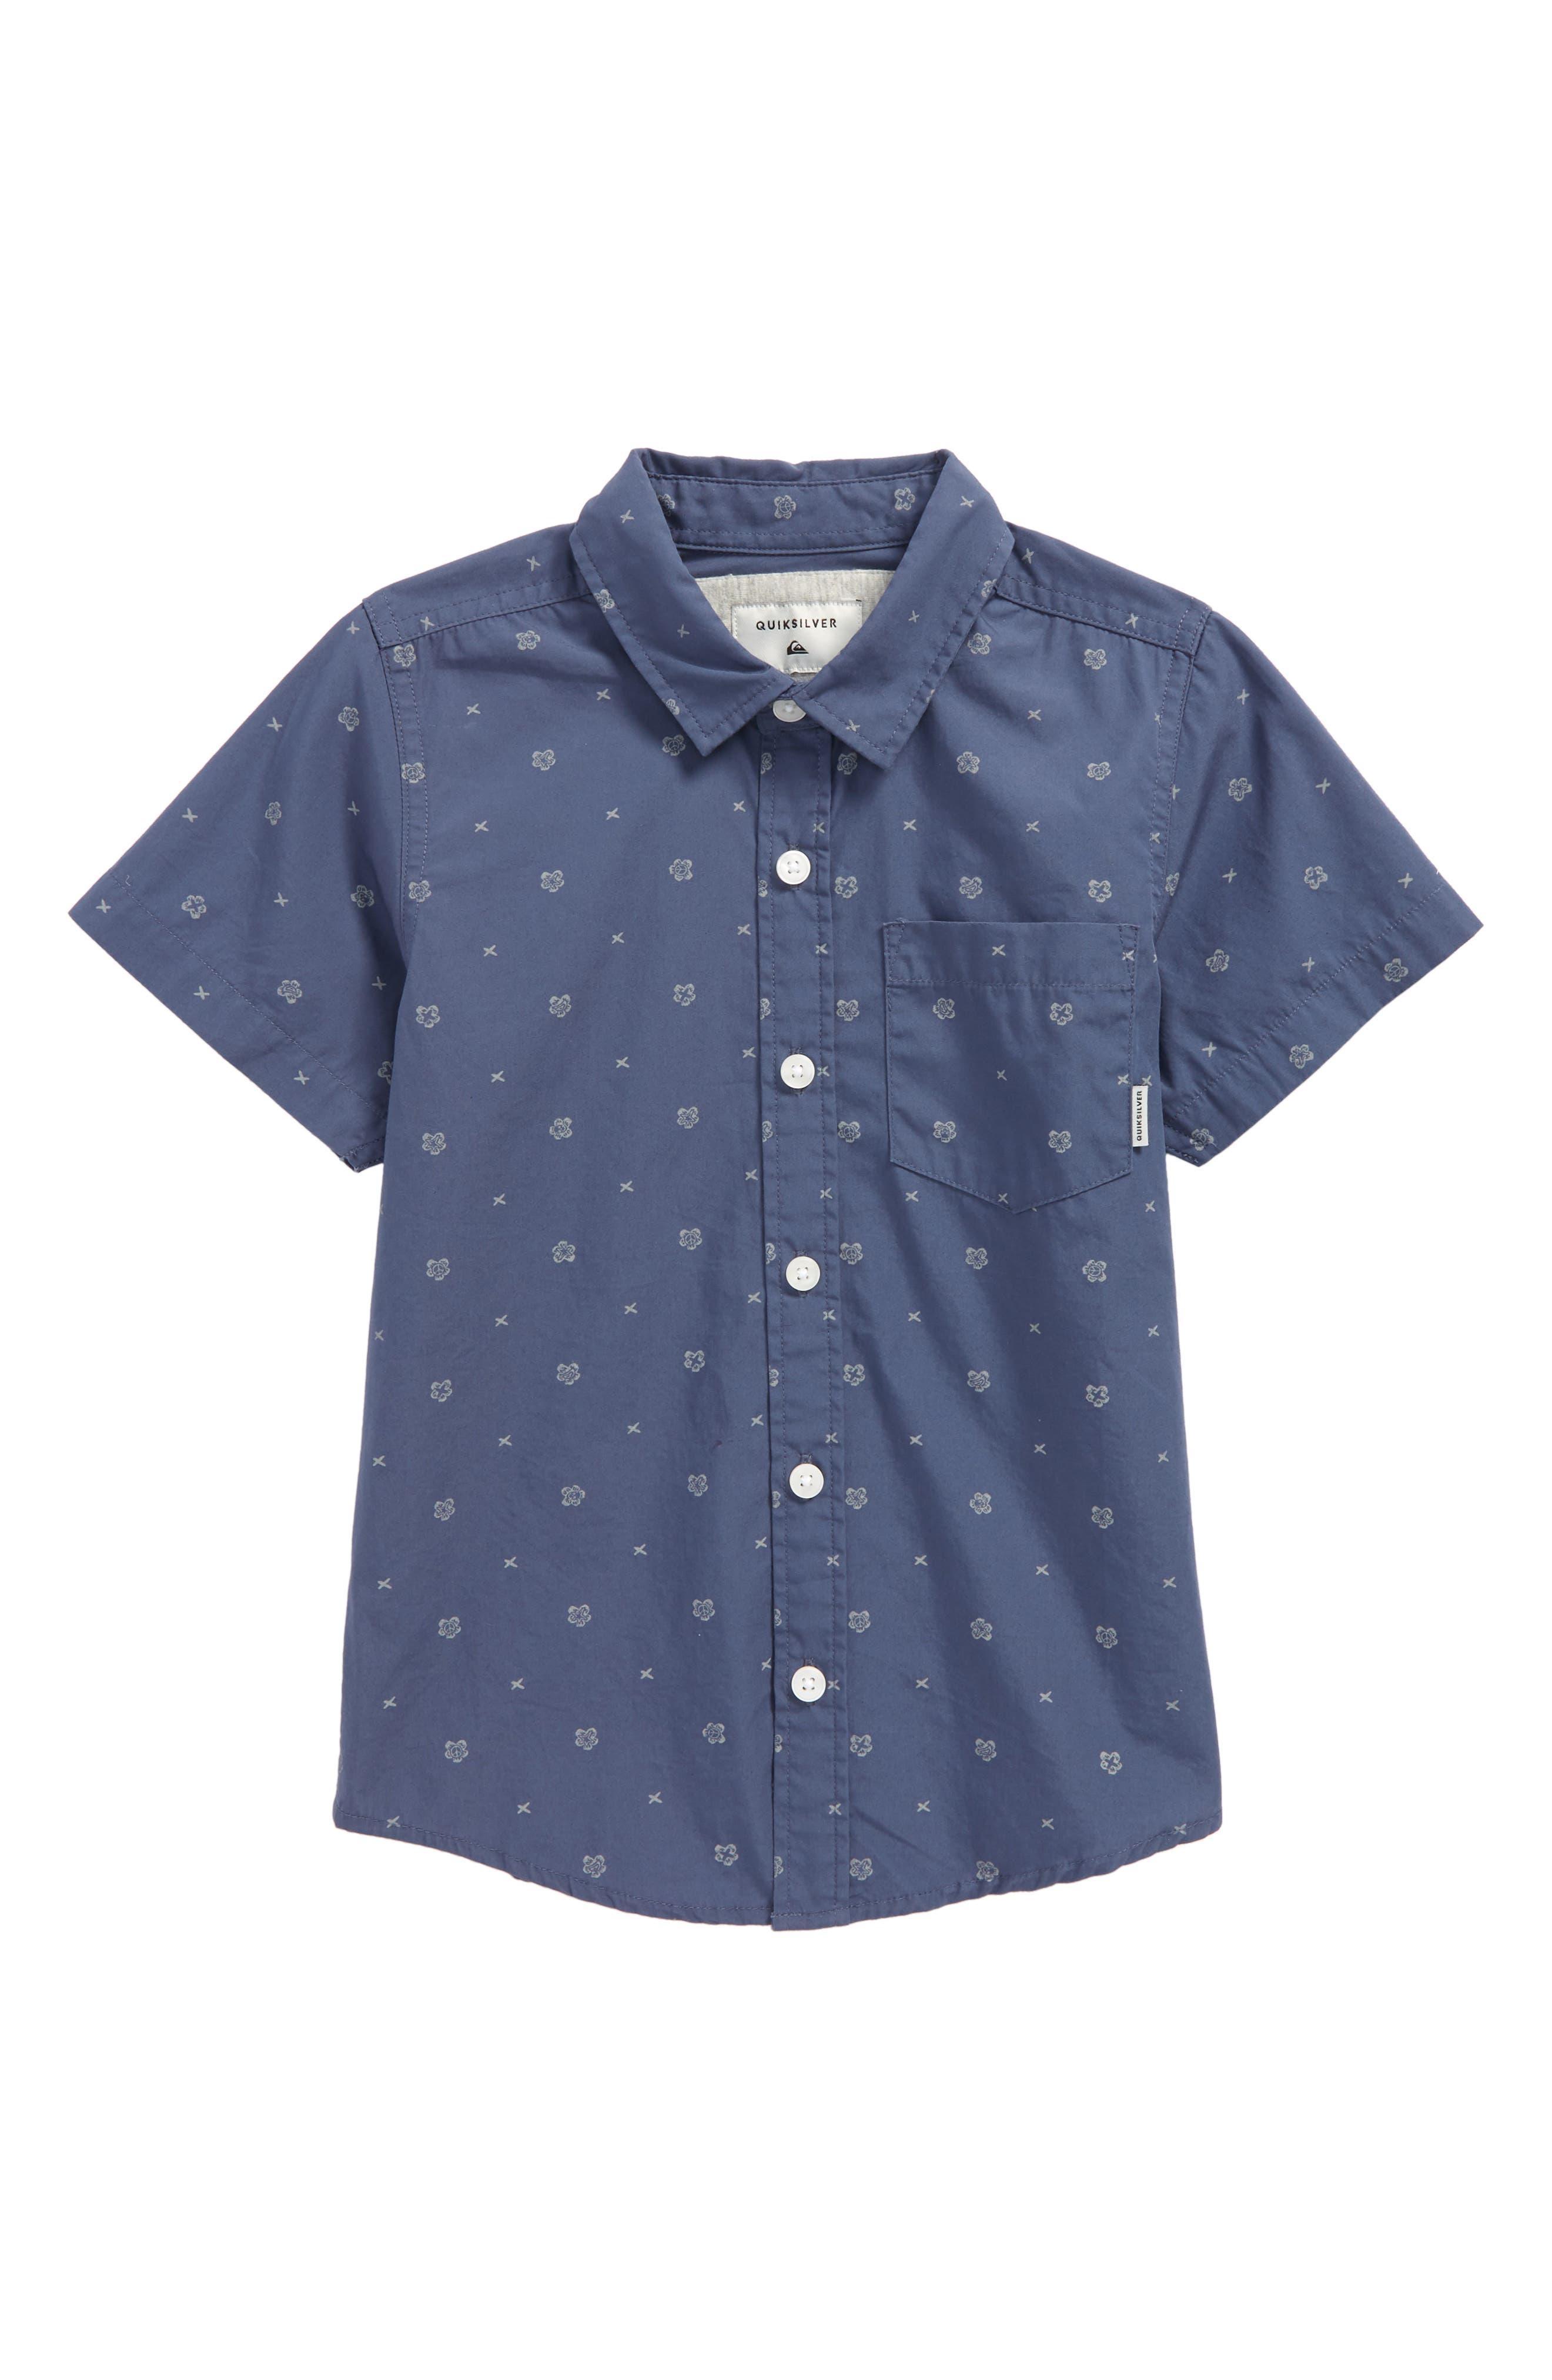 Quiksilver Kamanoa Woven Shirt (Toddler Boys & Little Boys)